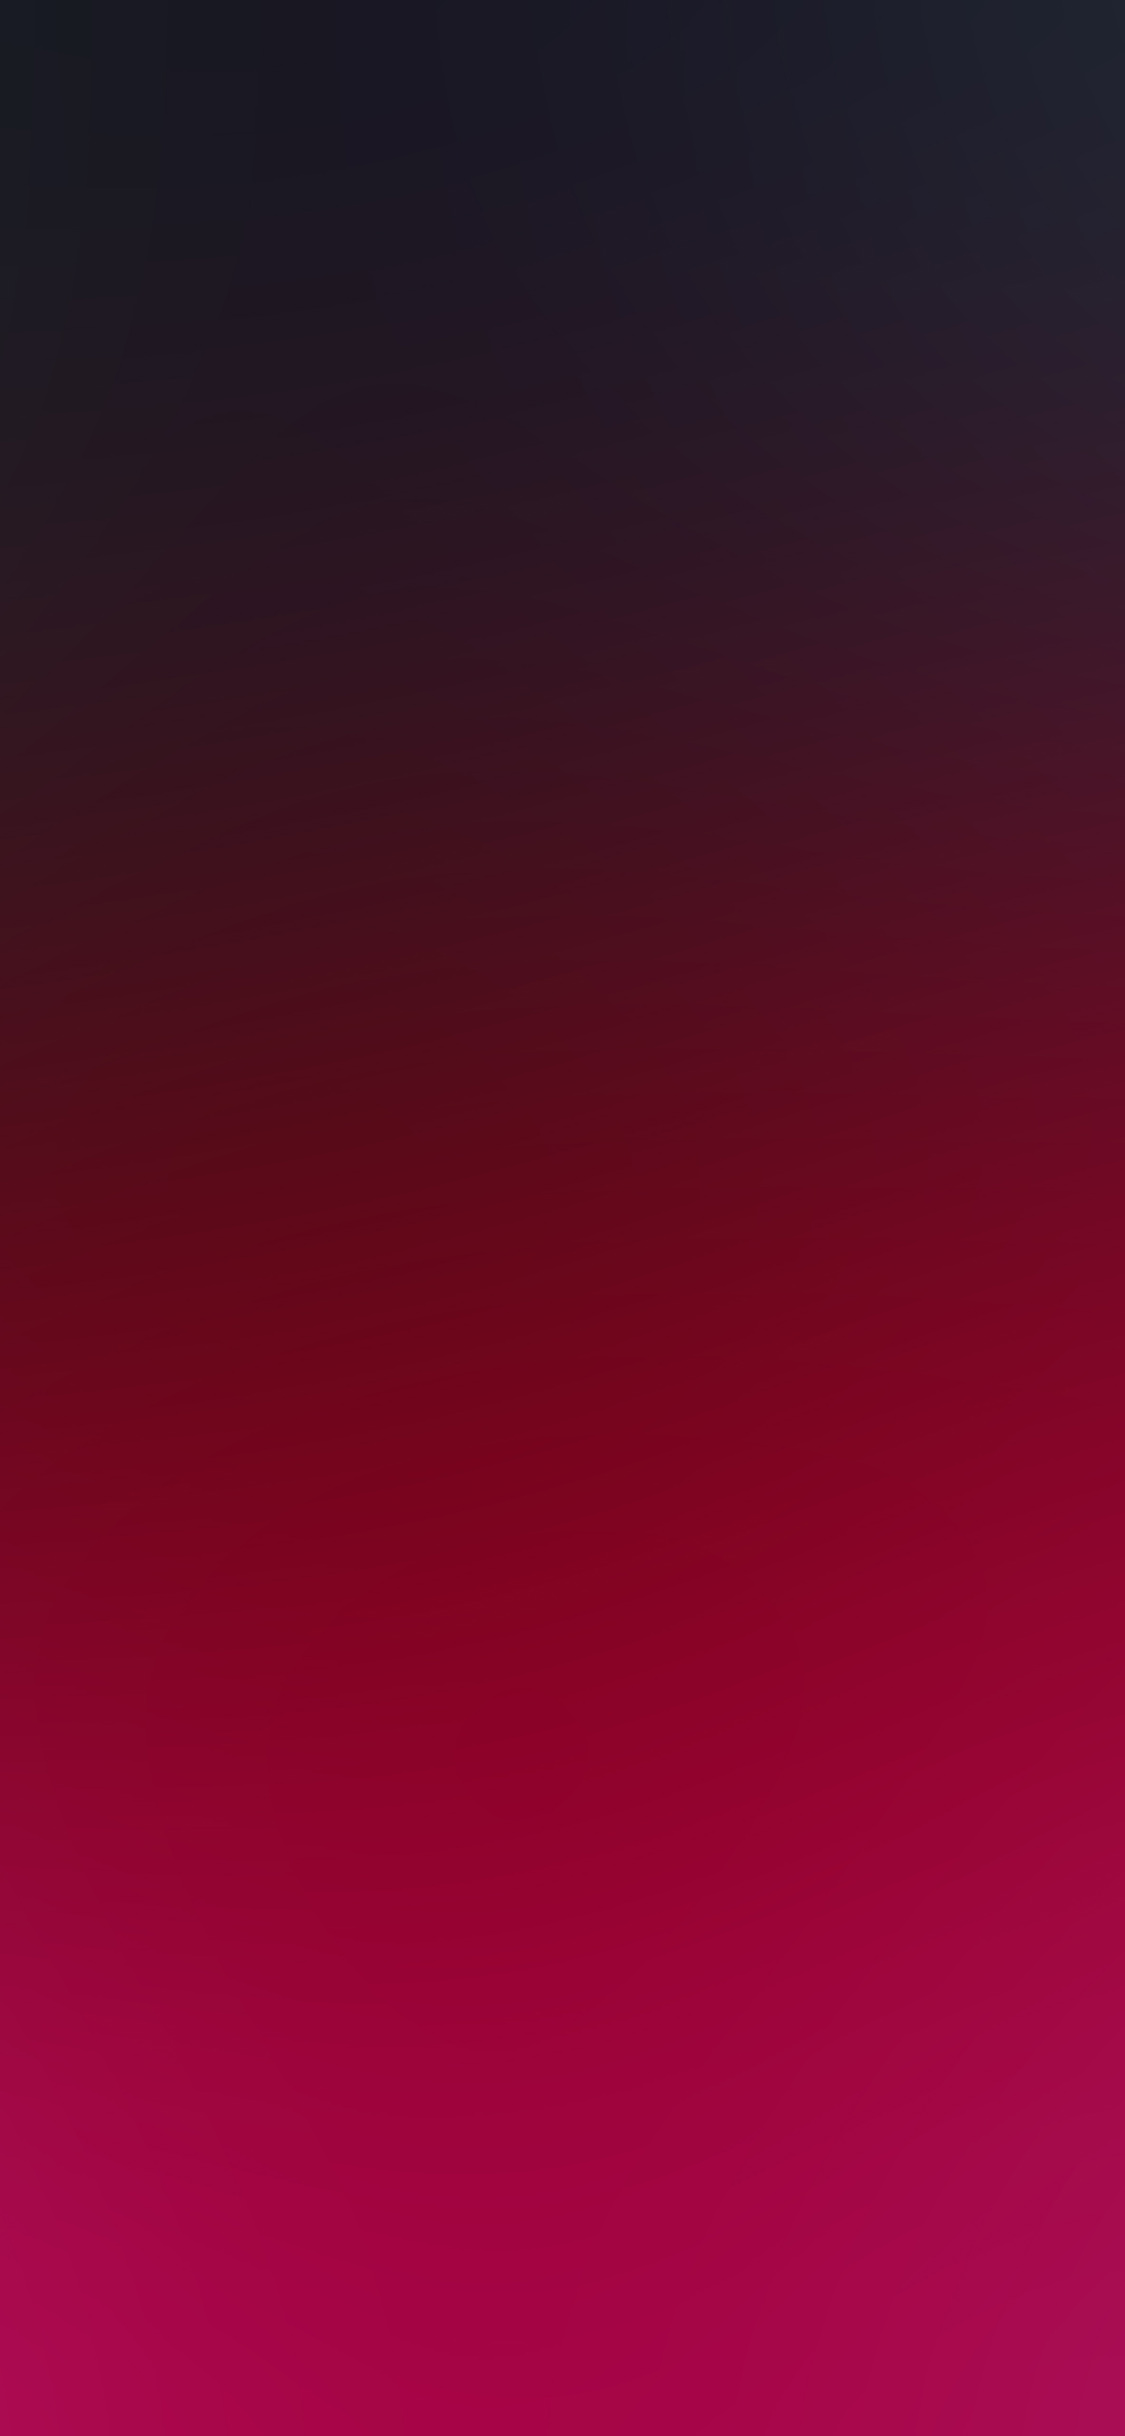 Iphonexpapers Com Apple Iphone Wallpaper Sh76 Red Dark